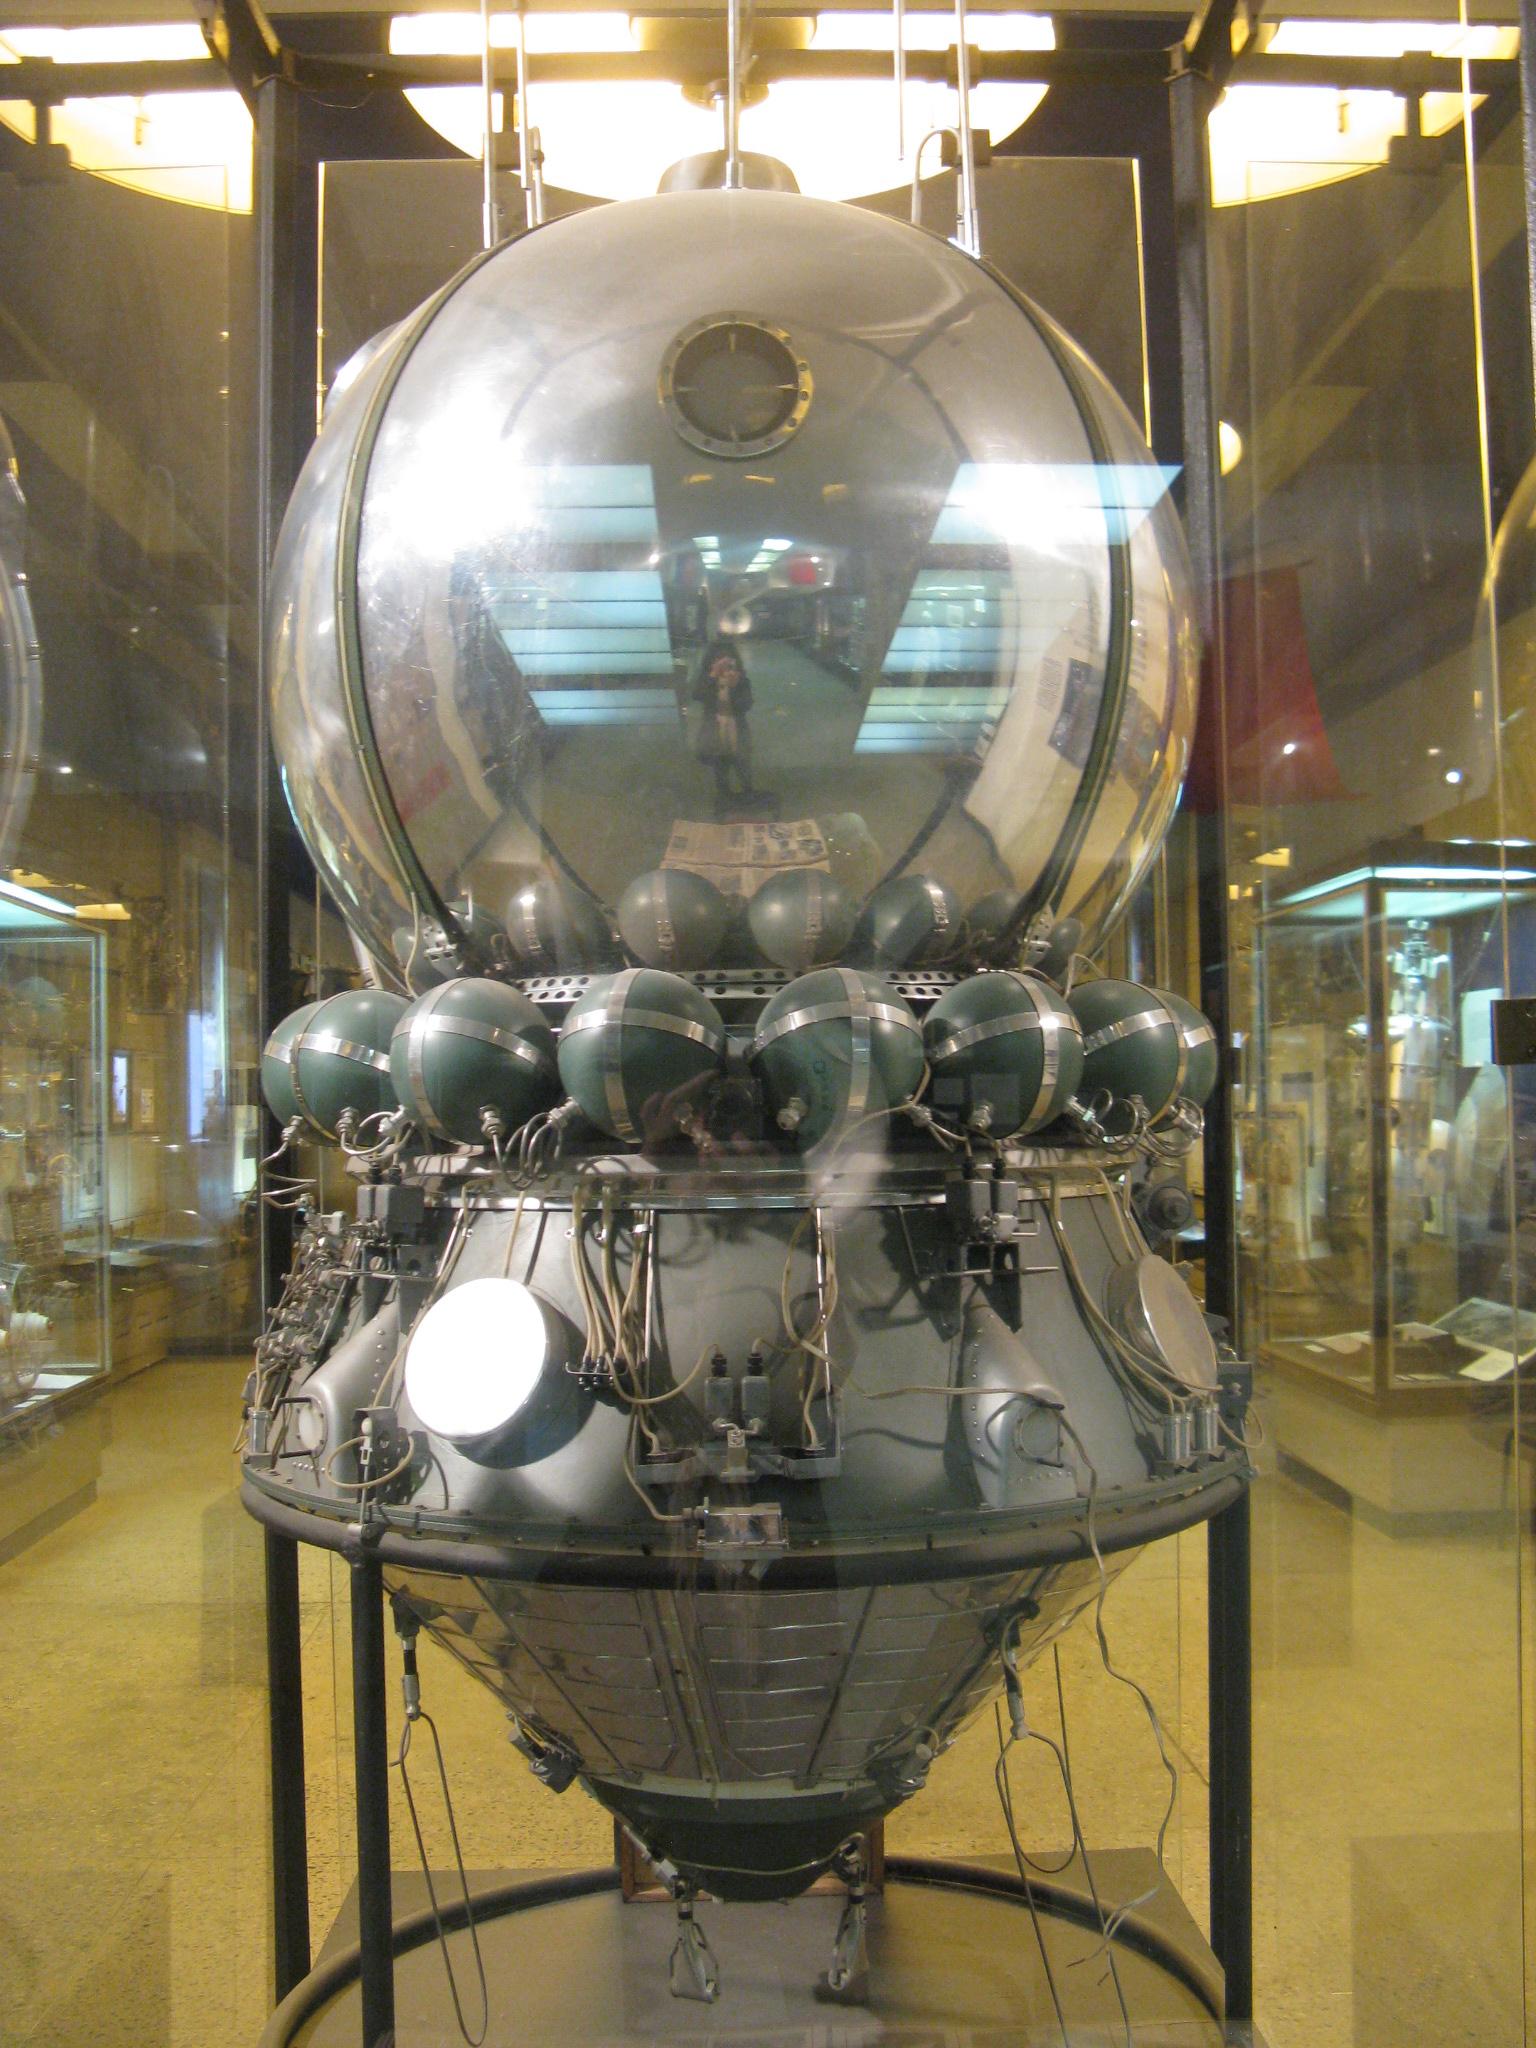 Maketa kosmiclé lodi Vostok (b.JPG